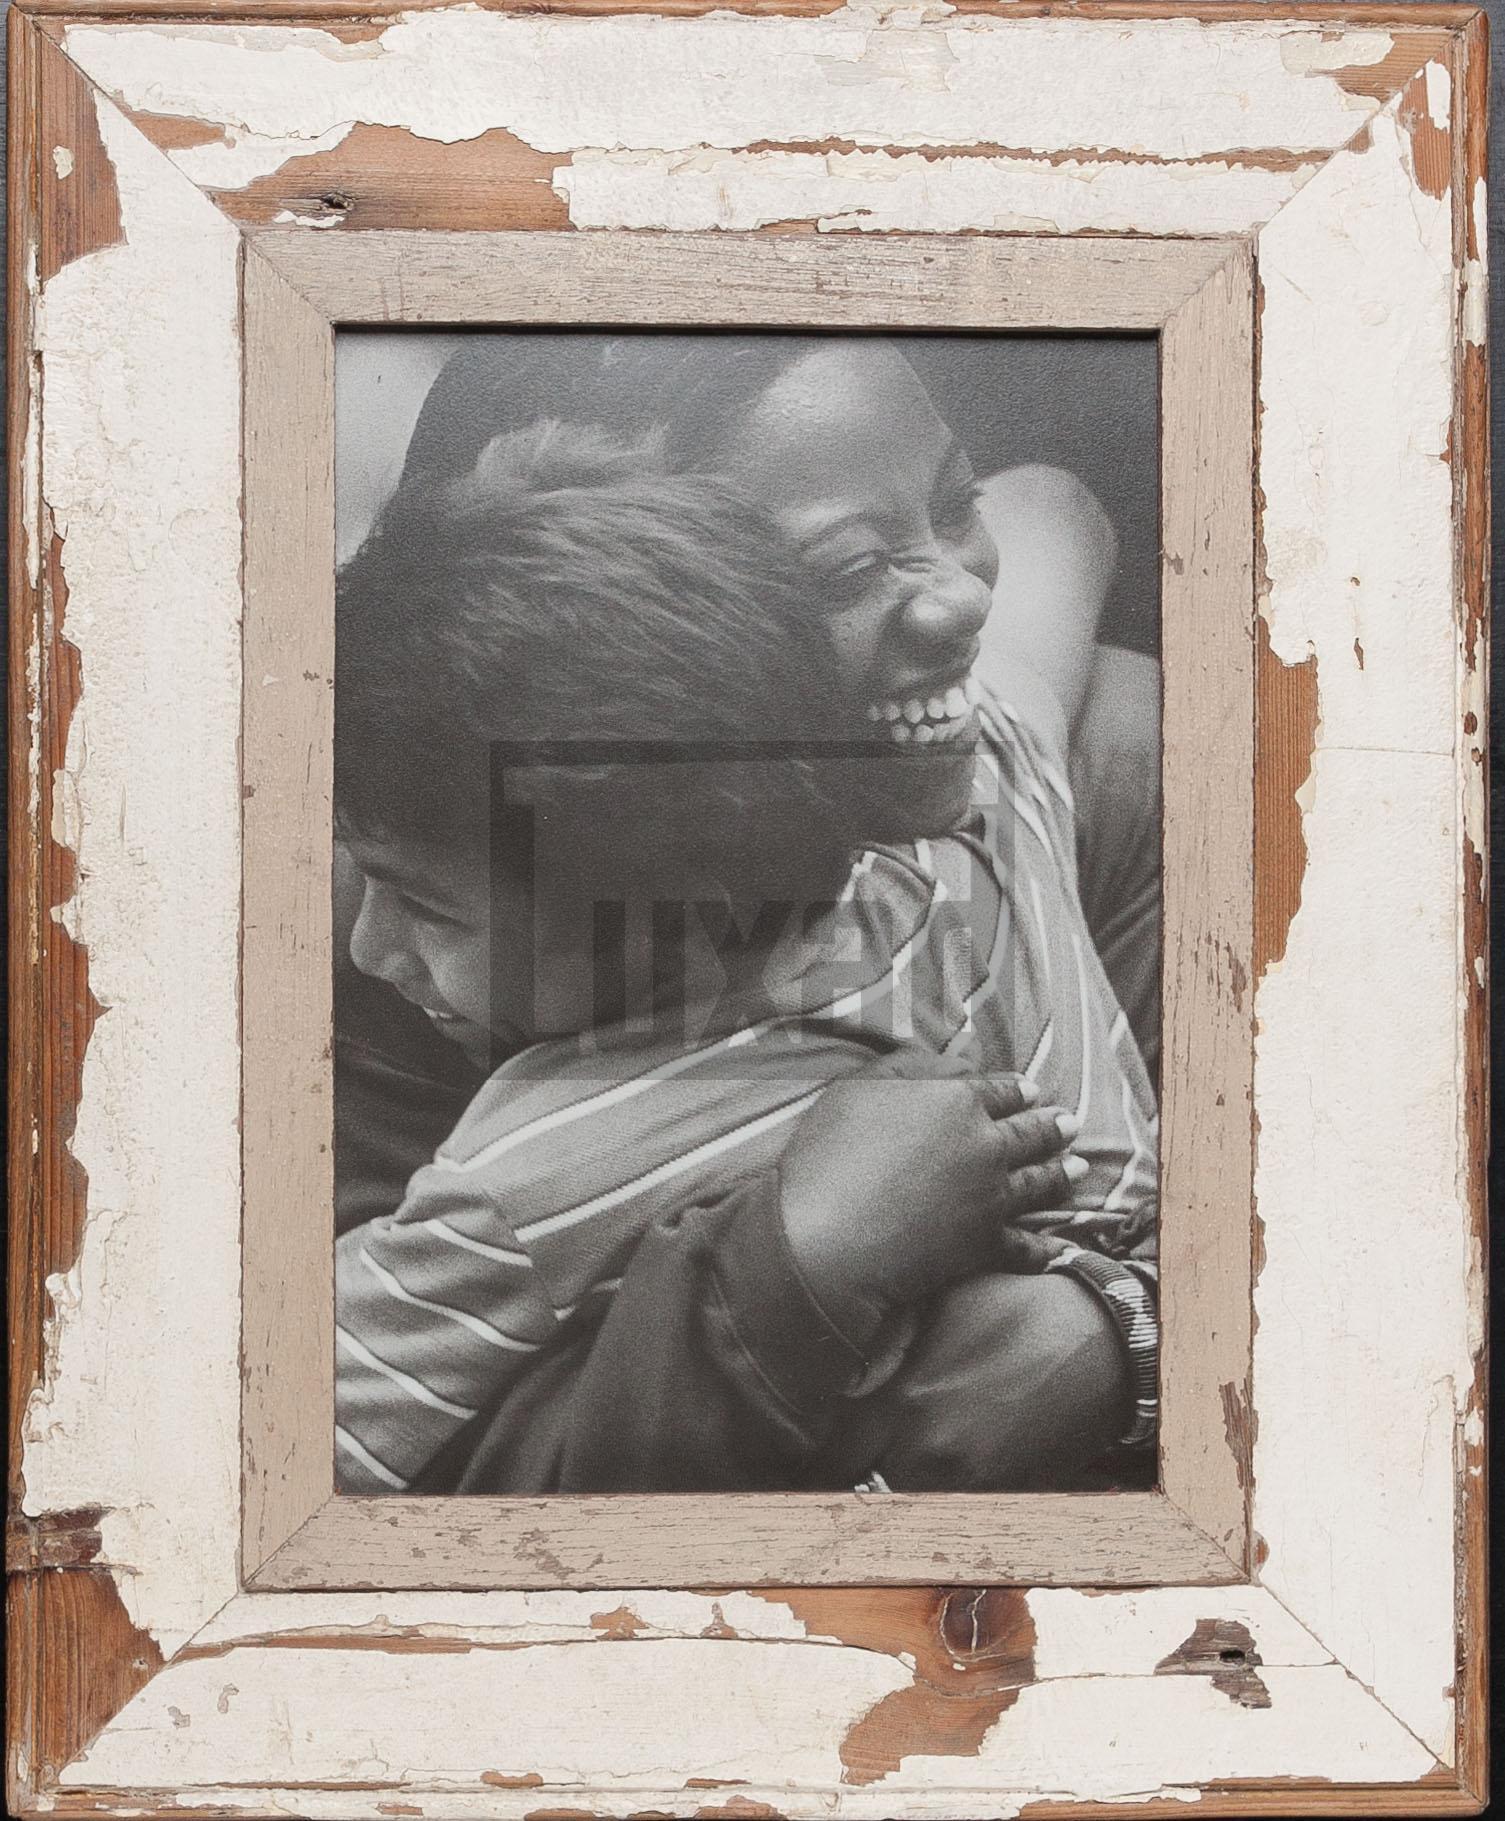 Vintage-Bilderrahmen aus altem Holz